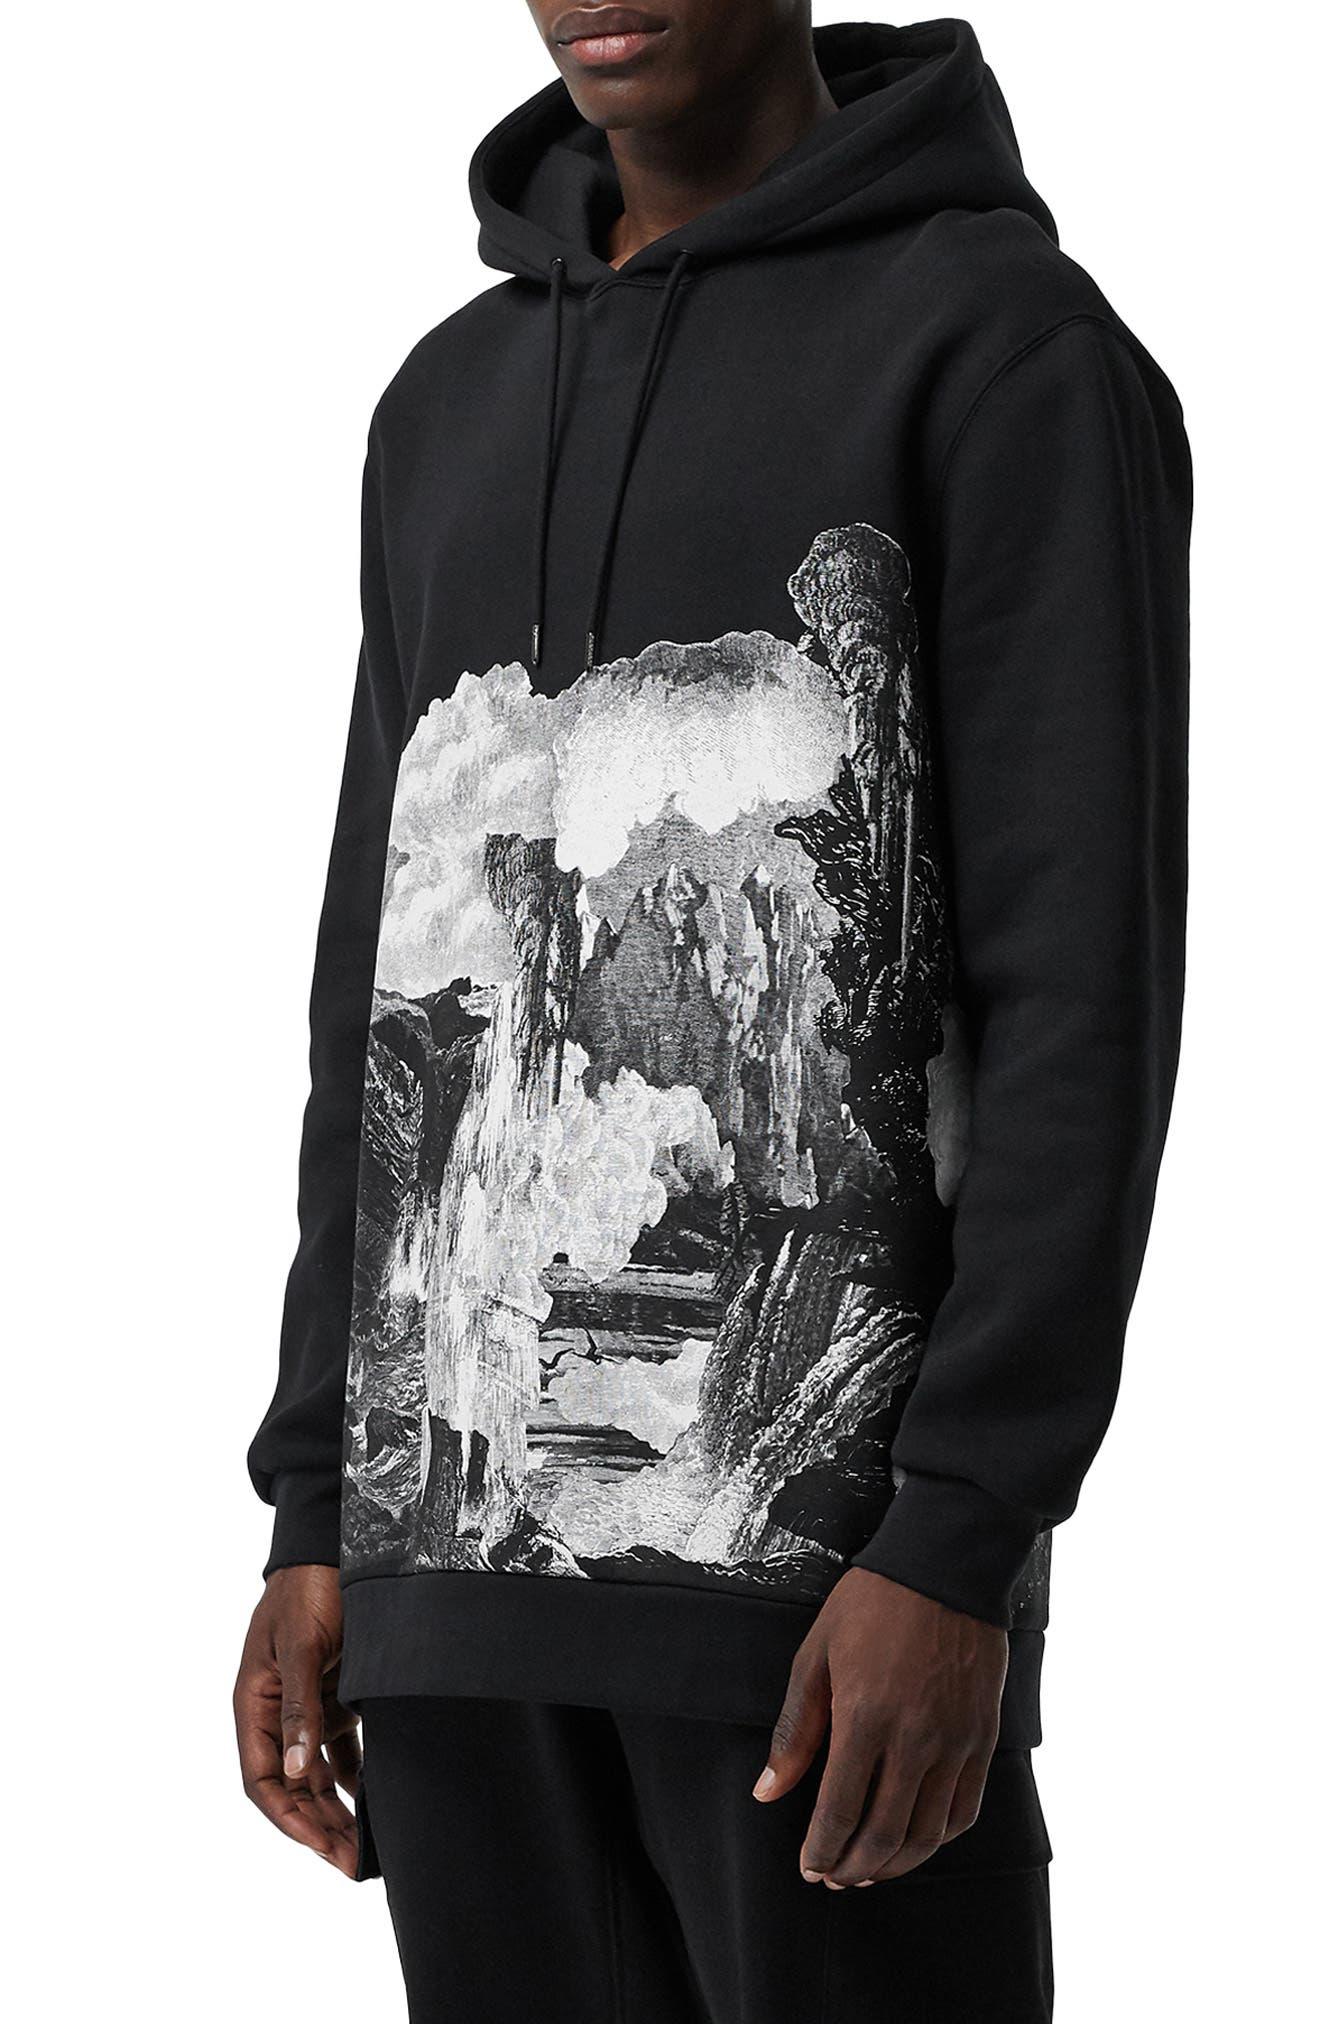 BURBERRY, Dreamscape Print Hooded Sweatshirt, Alternate thumbnail 2, color, BLACK